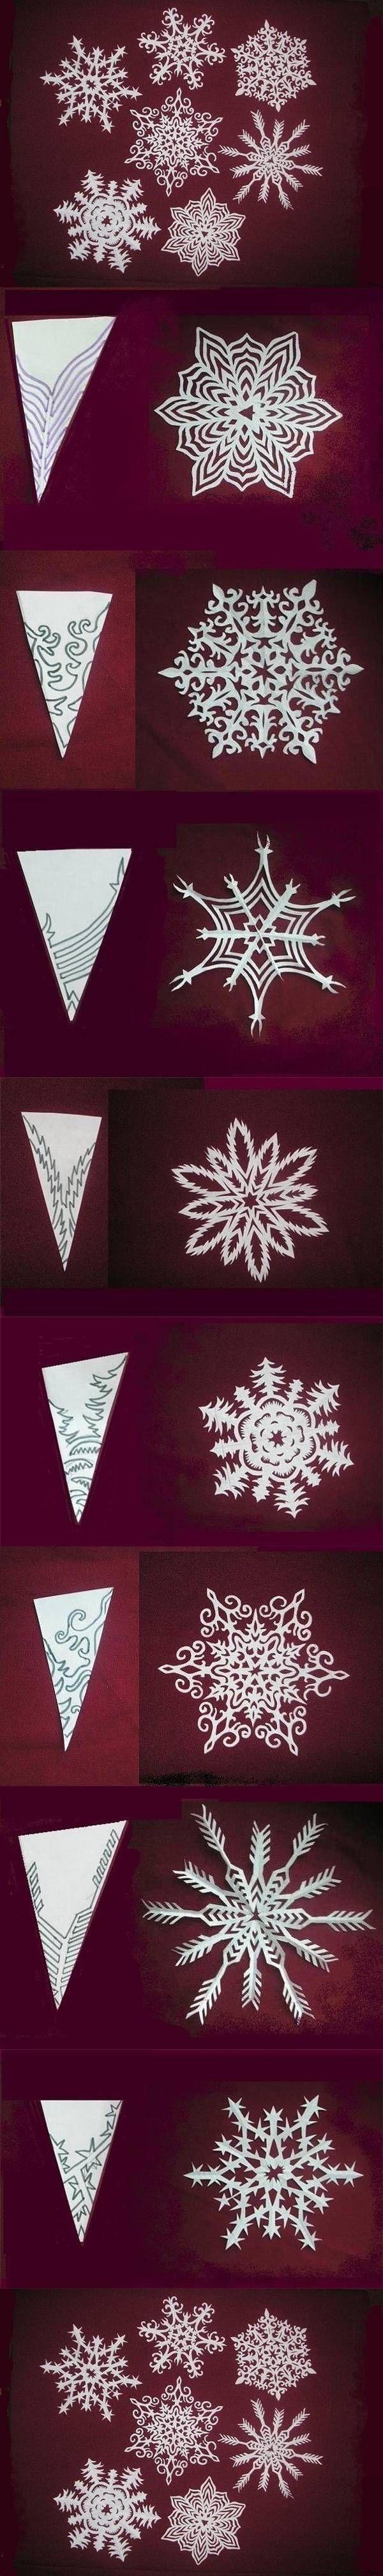 DIY Snowflakes Paper Pattern Tutorial diy craft crafts diy crafts how to tutorial winter crafts christmas crafts christmas decorations